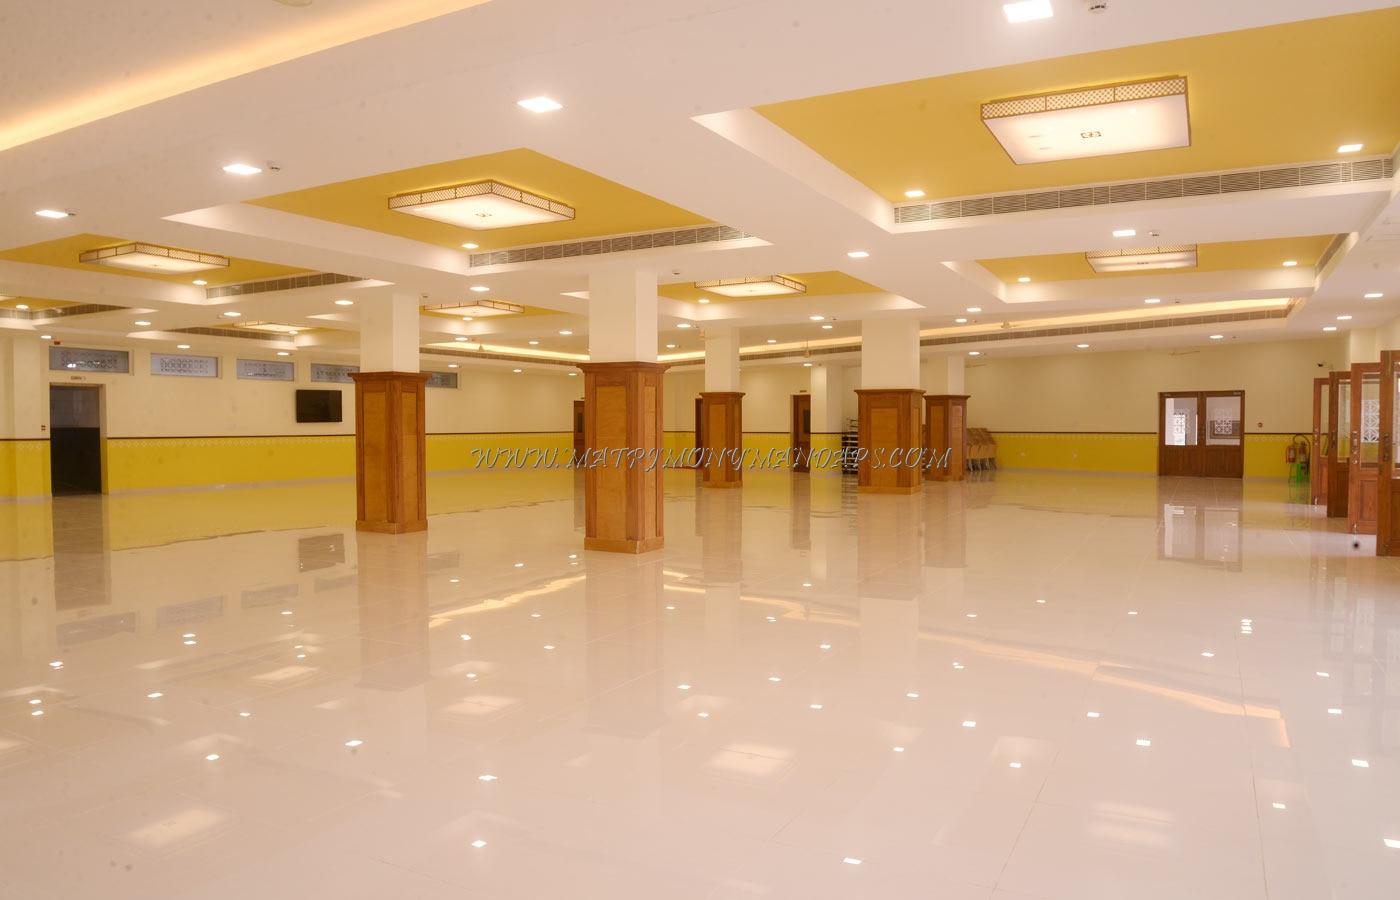 Shree Chaitanya Function Hall - Dining Hall